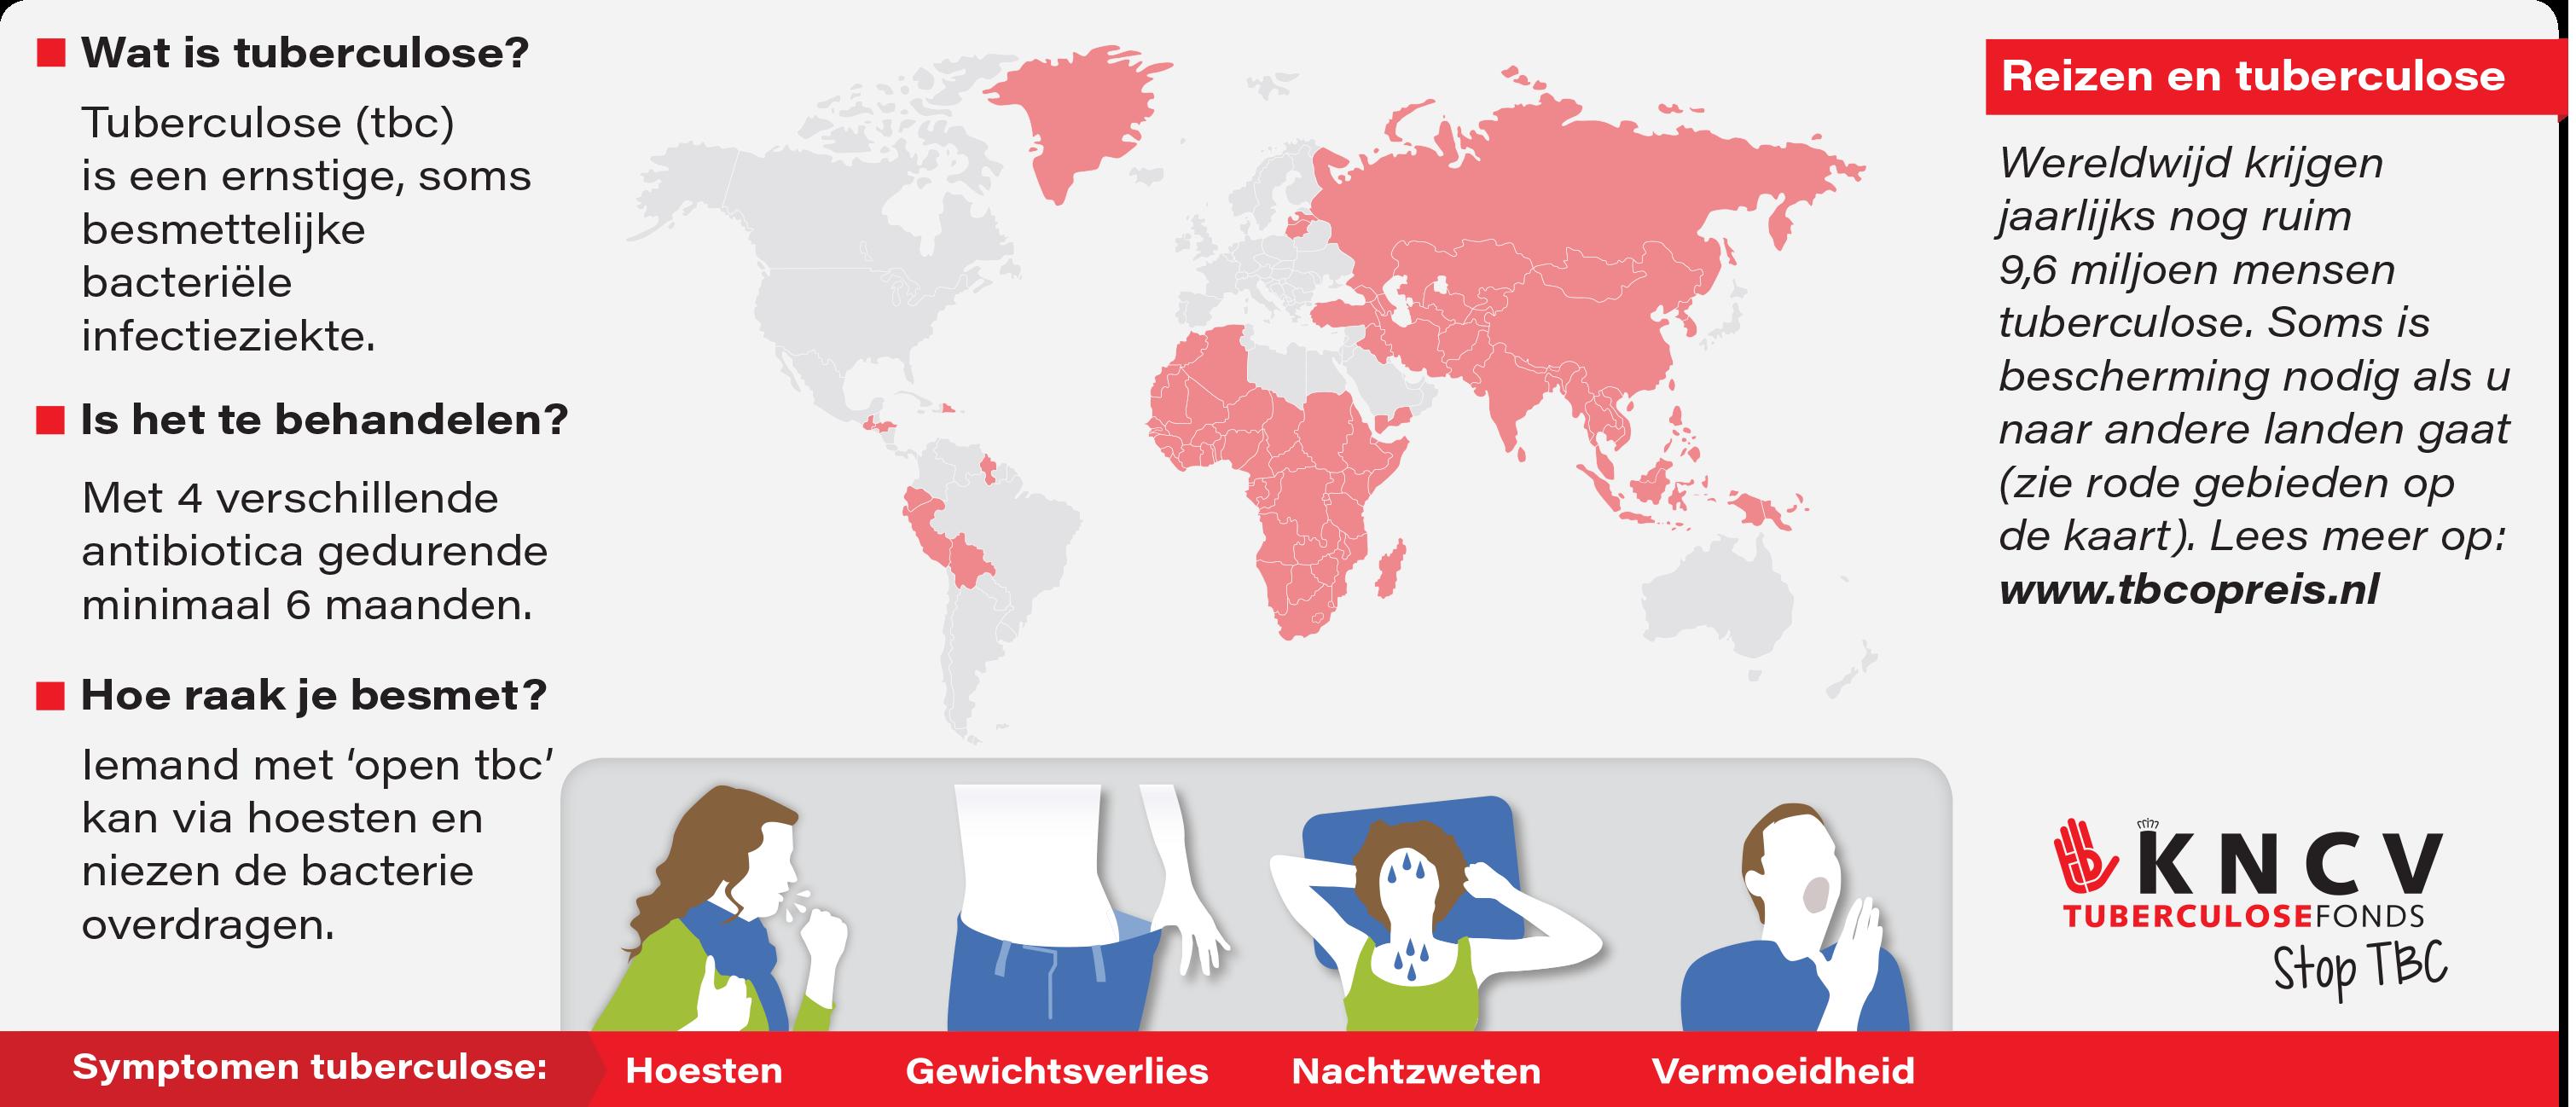 Reis Infographic Kncv Tuberculosefonds